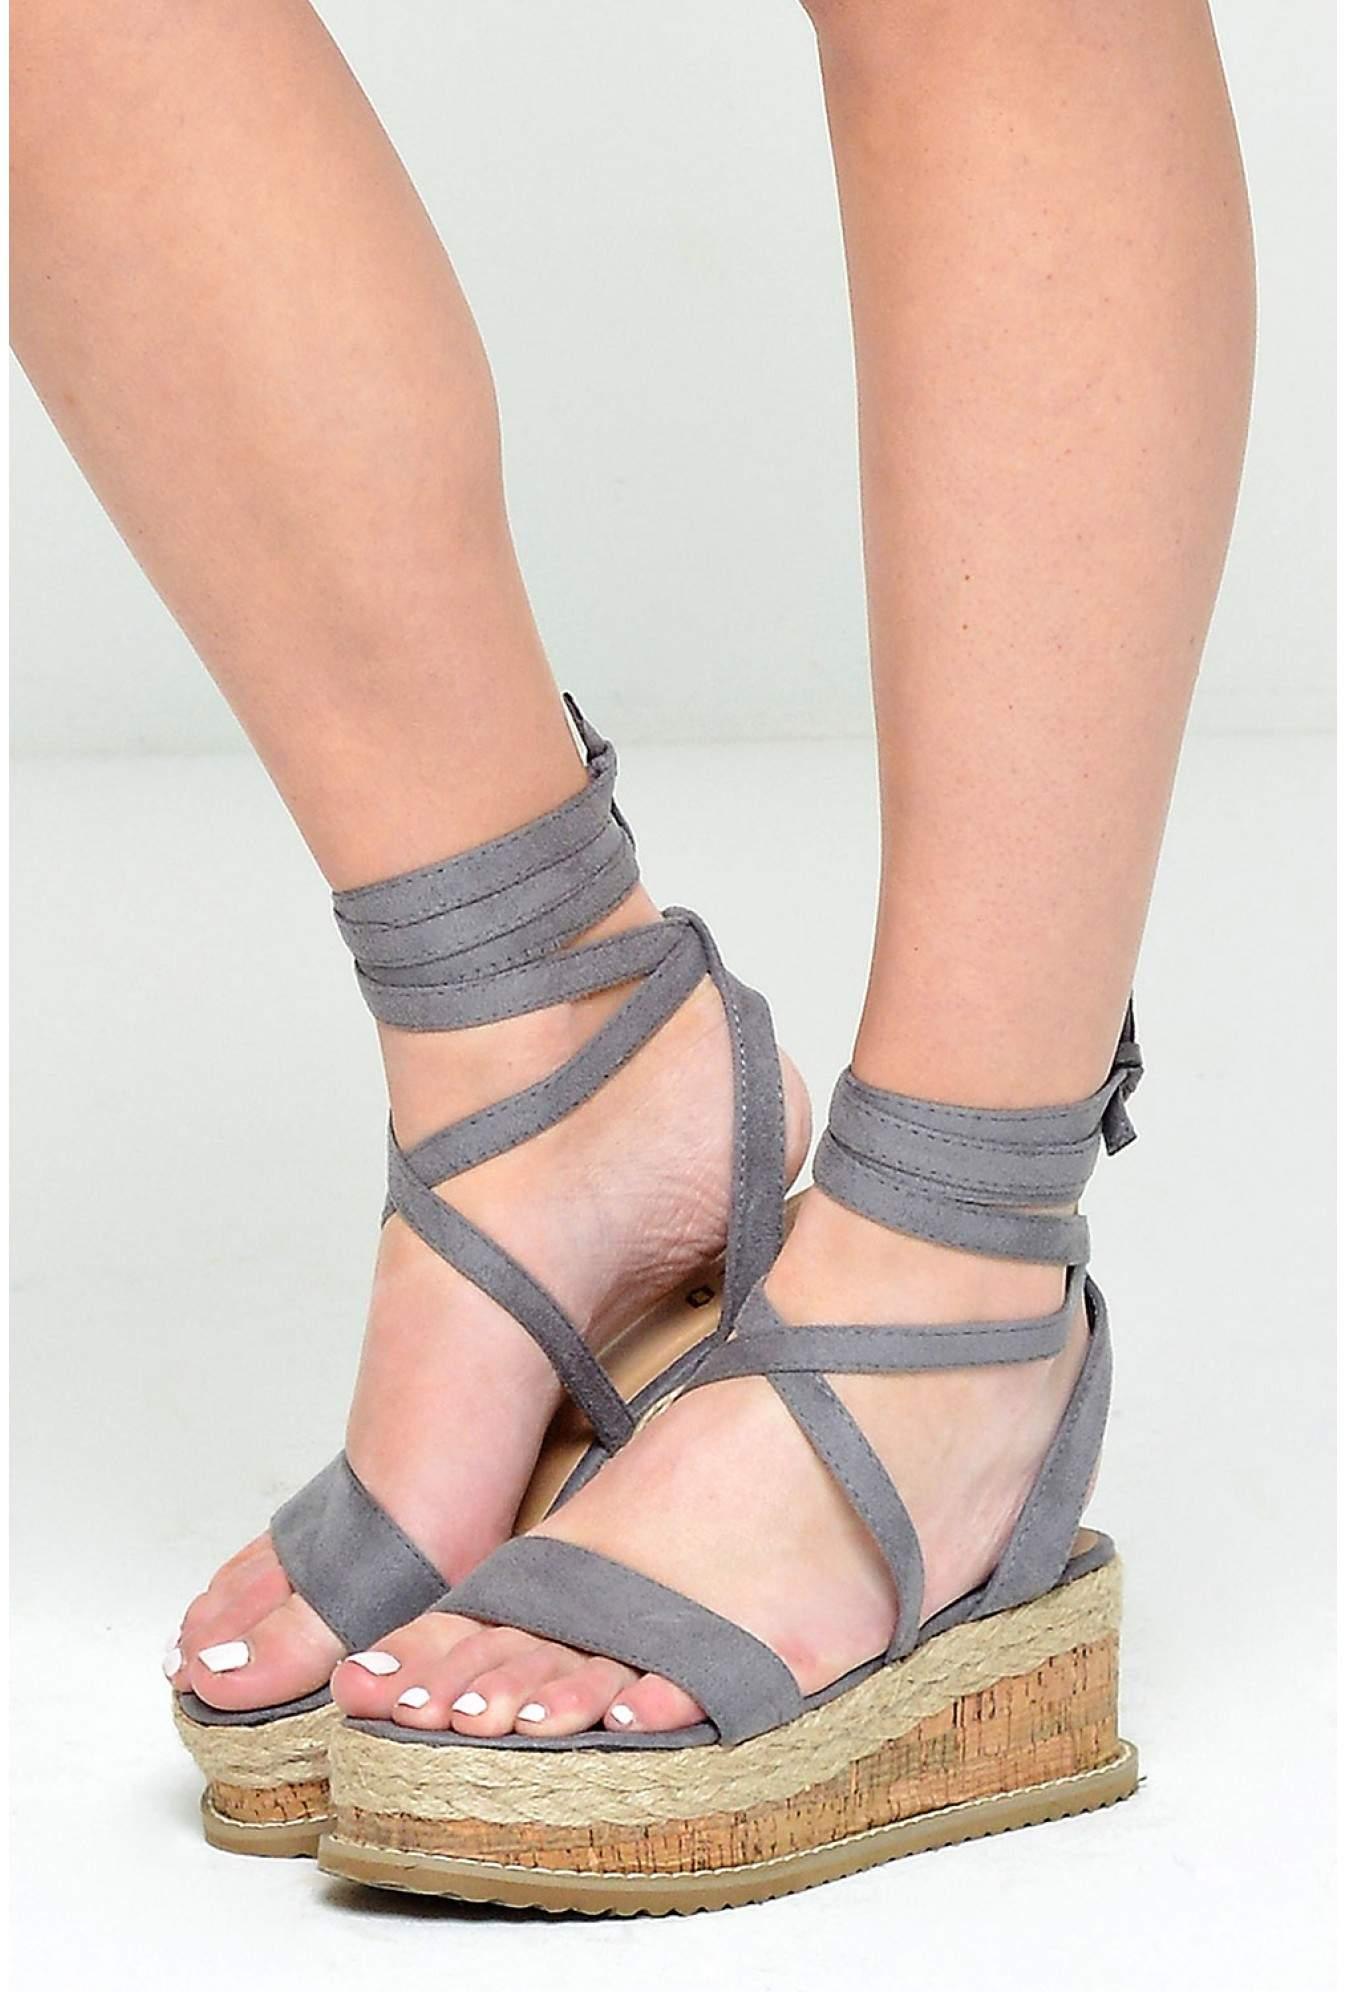 321ebc039ead No Doubt Ingrid Lace Up Espadrilles Platform Sandals in Grey